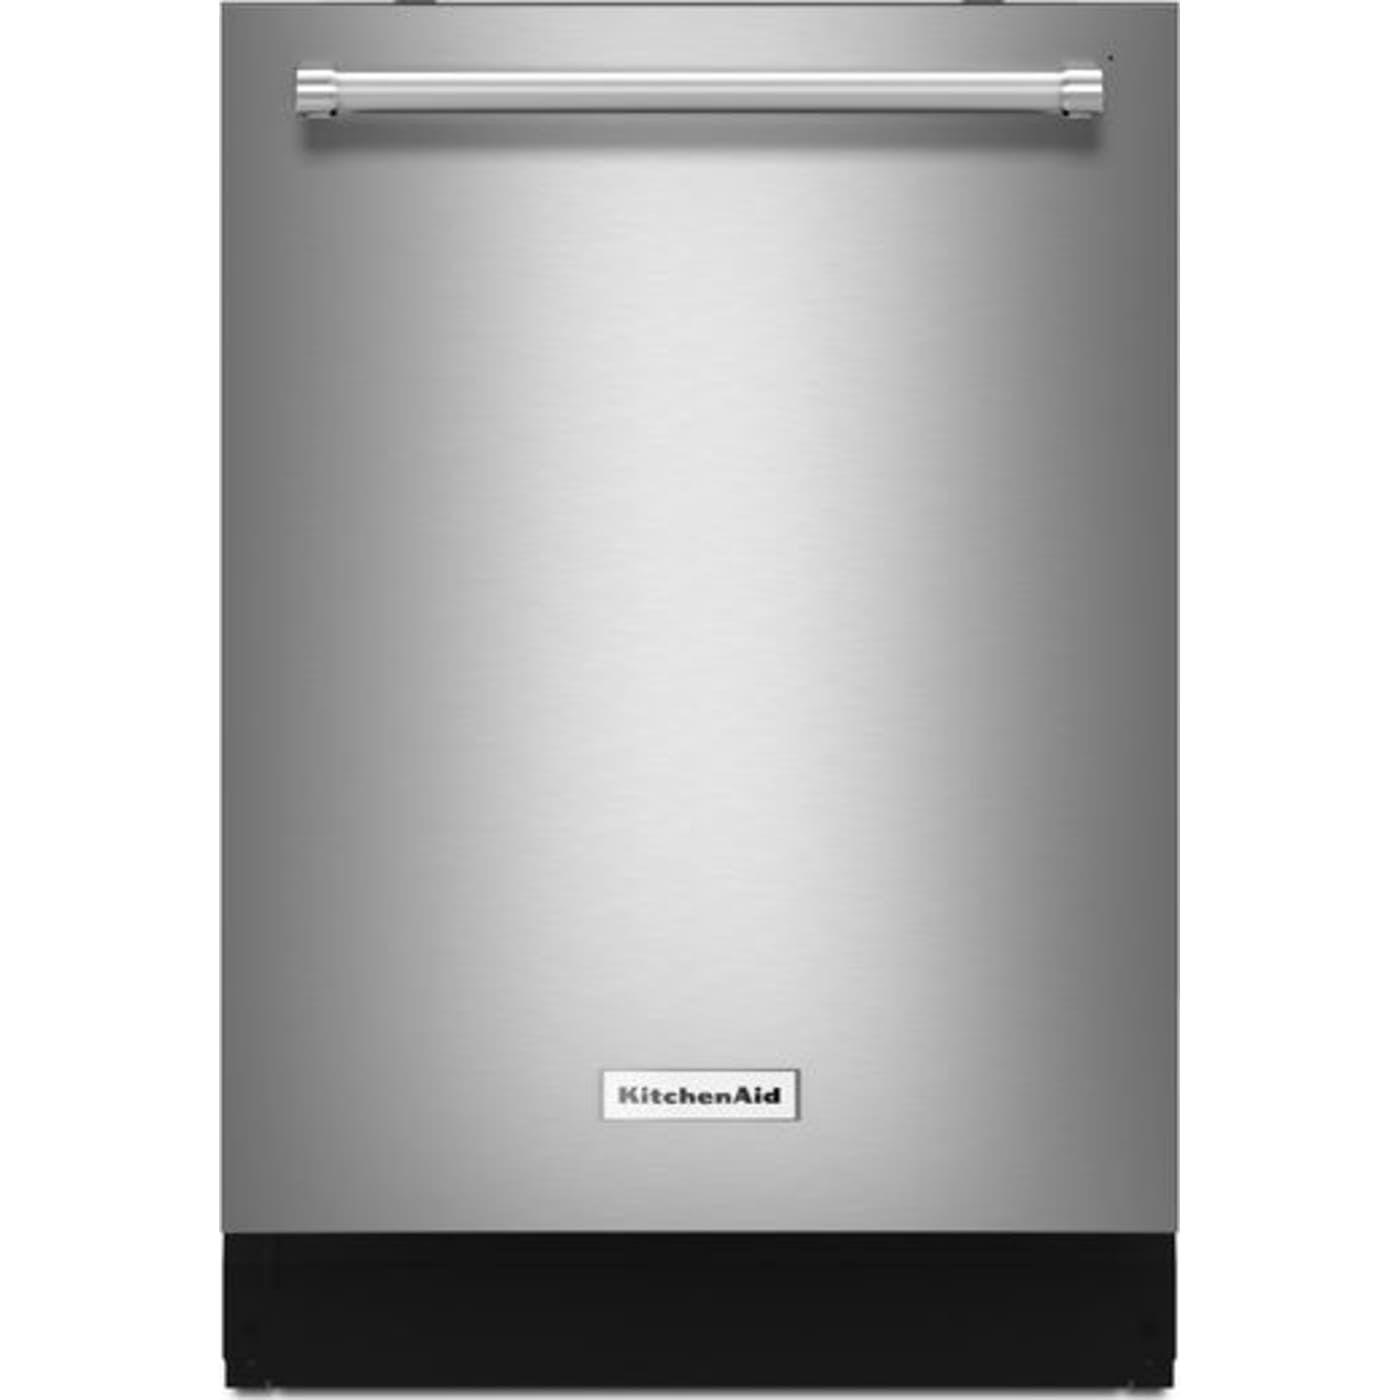 Kdte304gps by kitchenaid fully integrated dishwashers